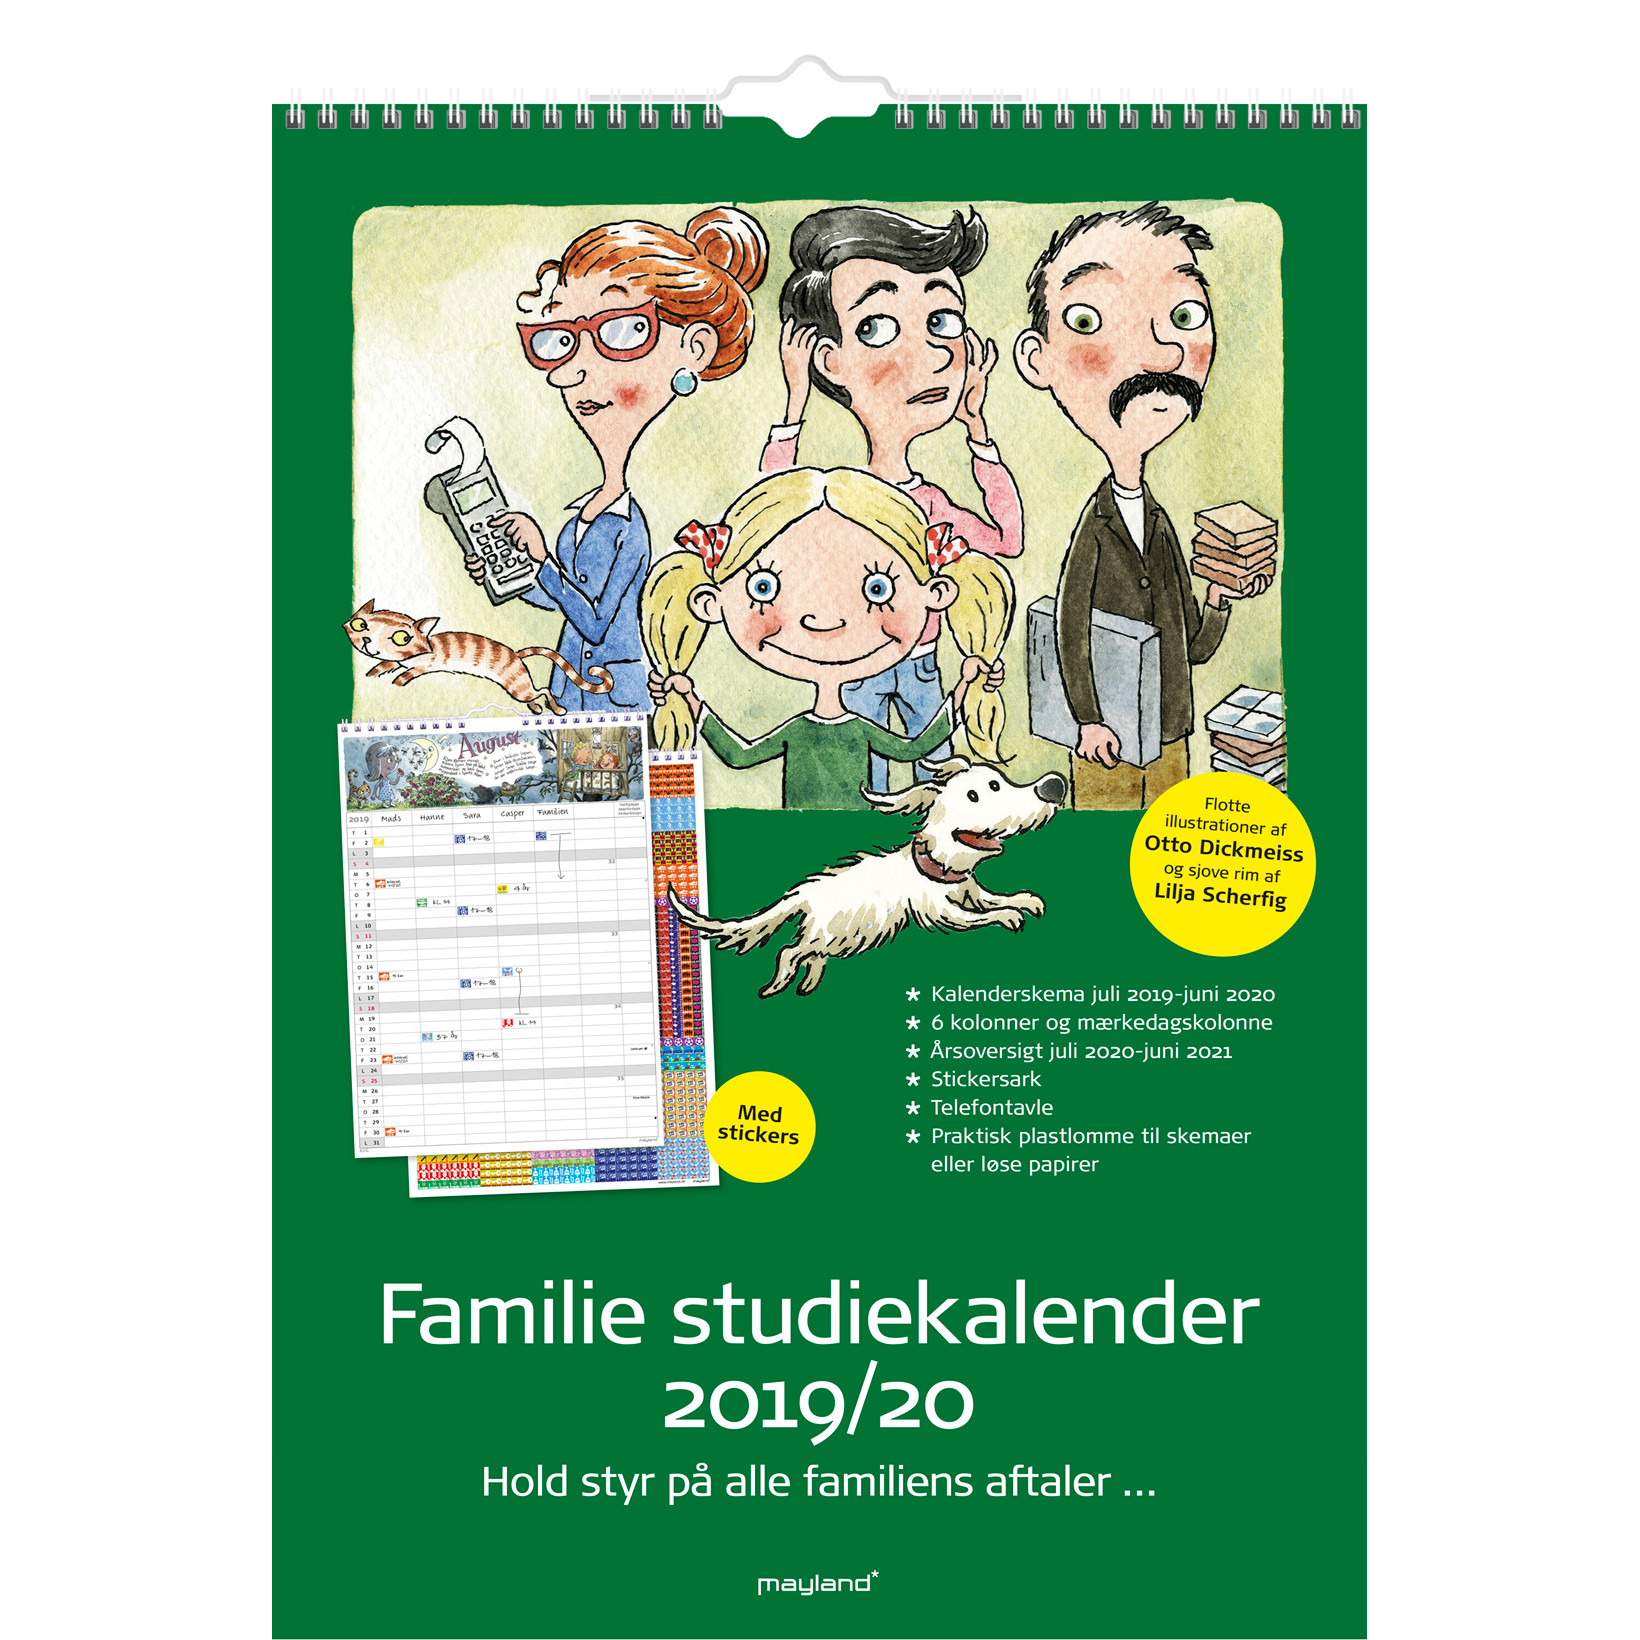 Familiekalender 19/20 30x42cm m/stickers 20 8079 00